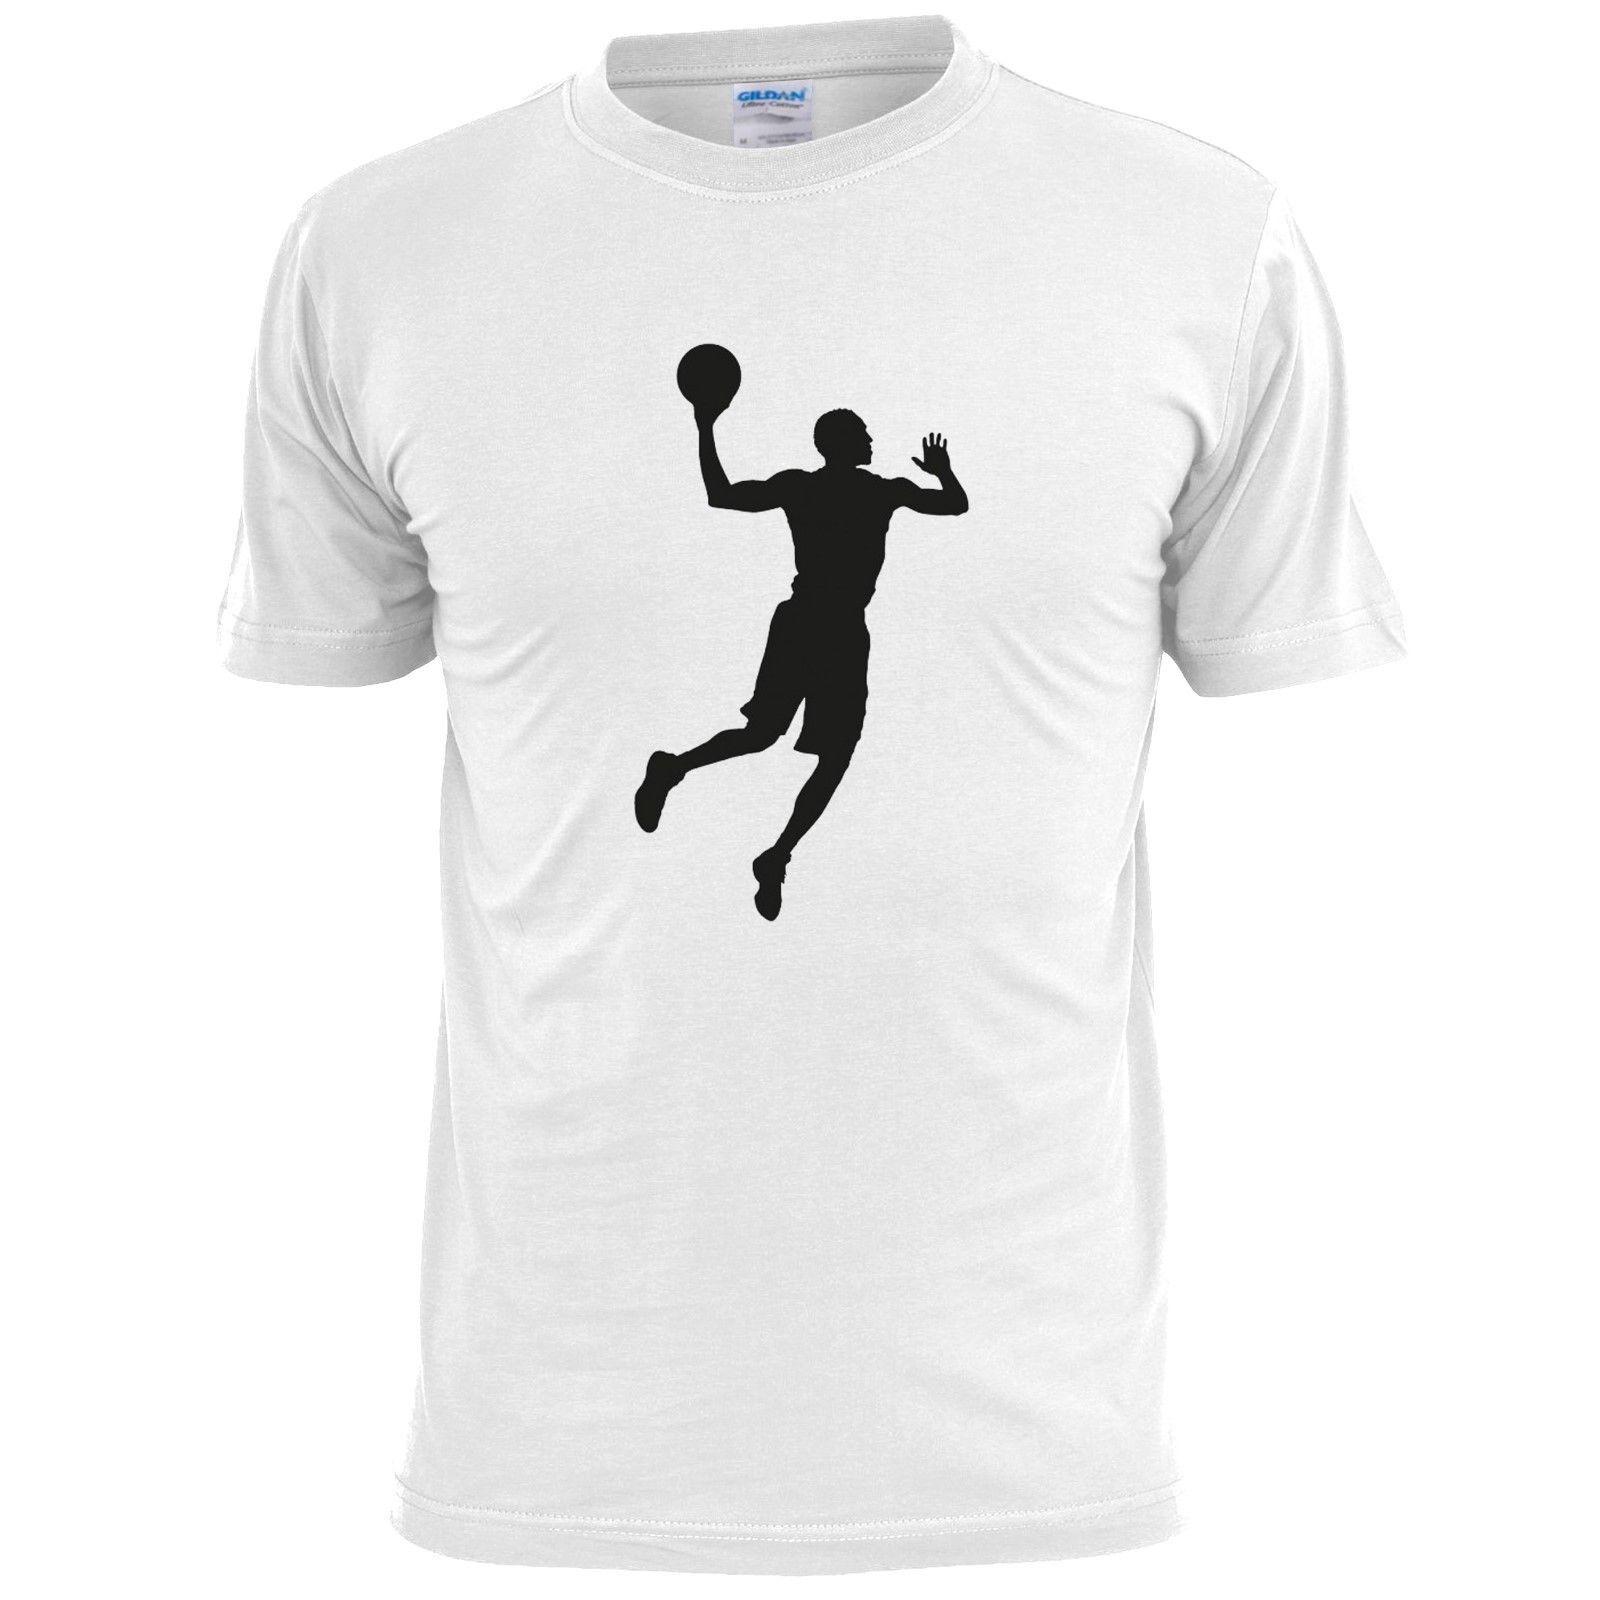 ac0355e24 SLAM DUNK BASKETBALL SILHOUETTE MENS T SHIRT Funny T Shirt Awesome T Shirts  From Mrbronson79, $10.86| DHgate.Com